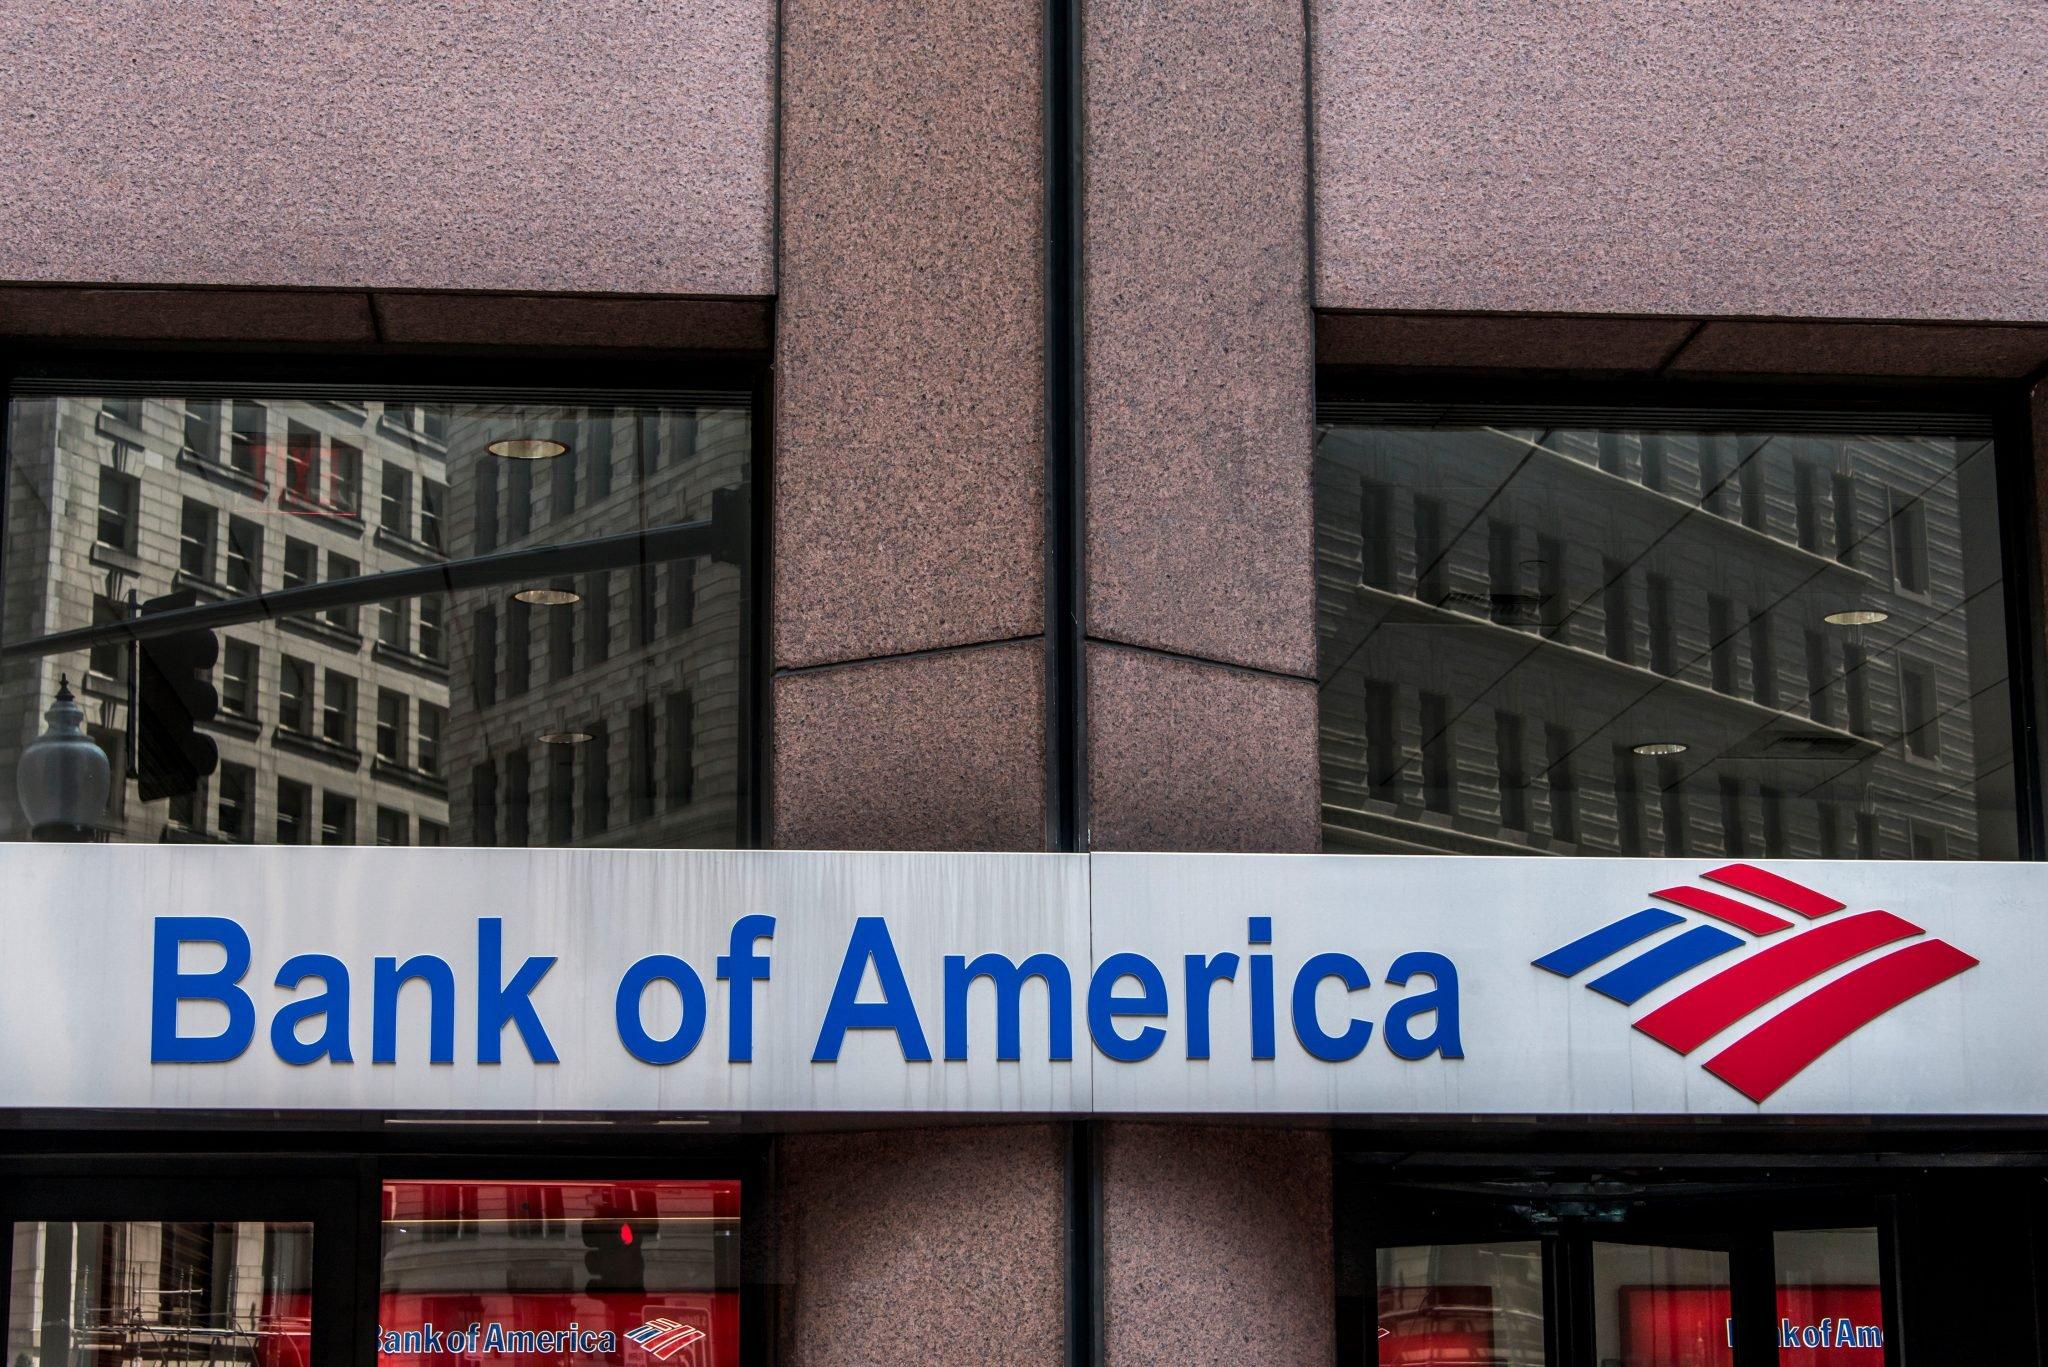 Boston massachusetts USA 06.09.2017 Bank of America logo American multinational banking financial services corporation